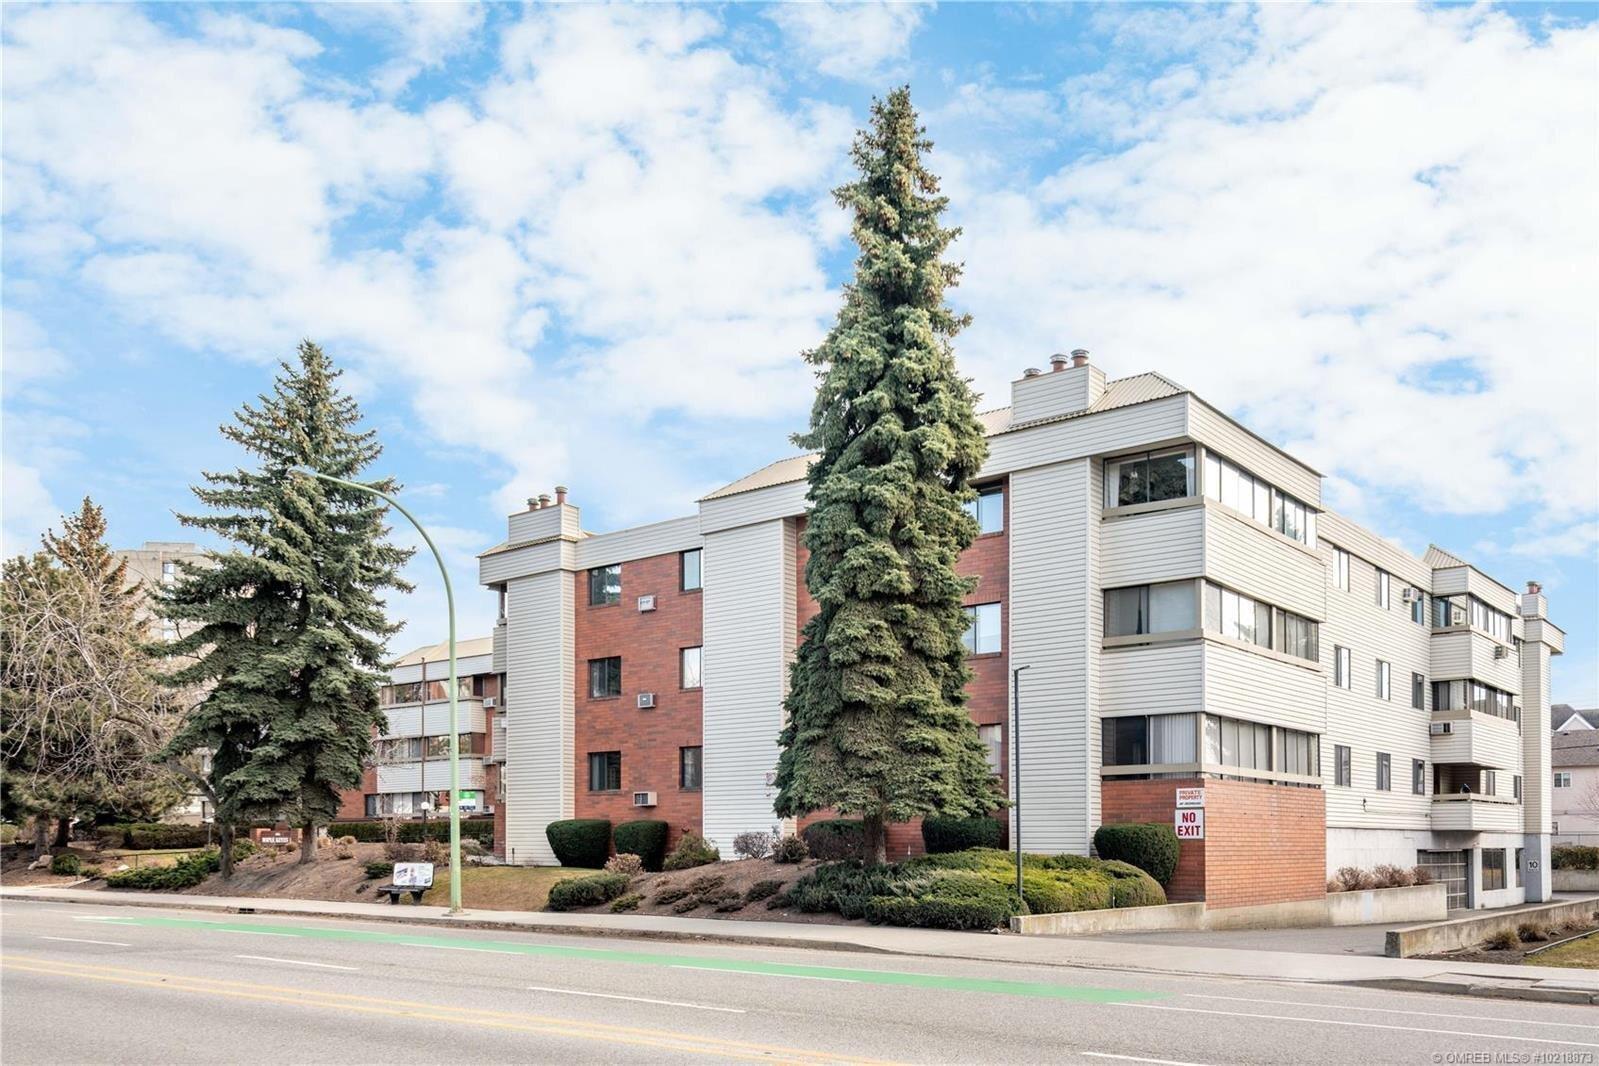 Condo for sale at 1075 Bernard Ave Unit 310 Kelowna British Columbia - MLS: 10218873